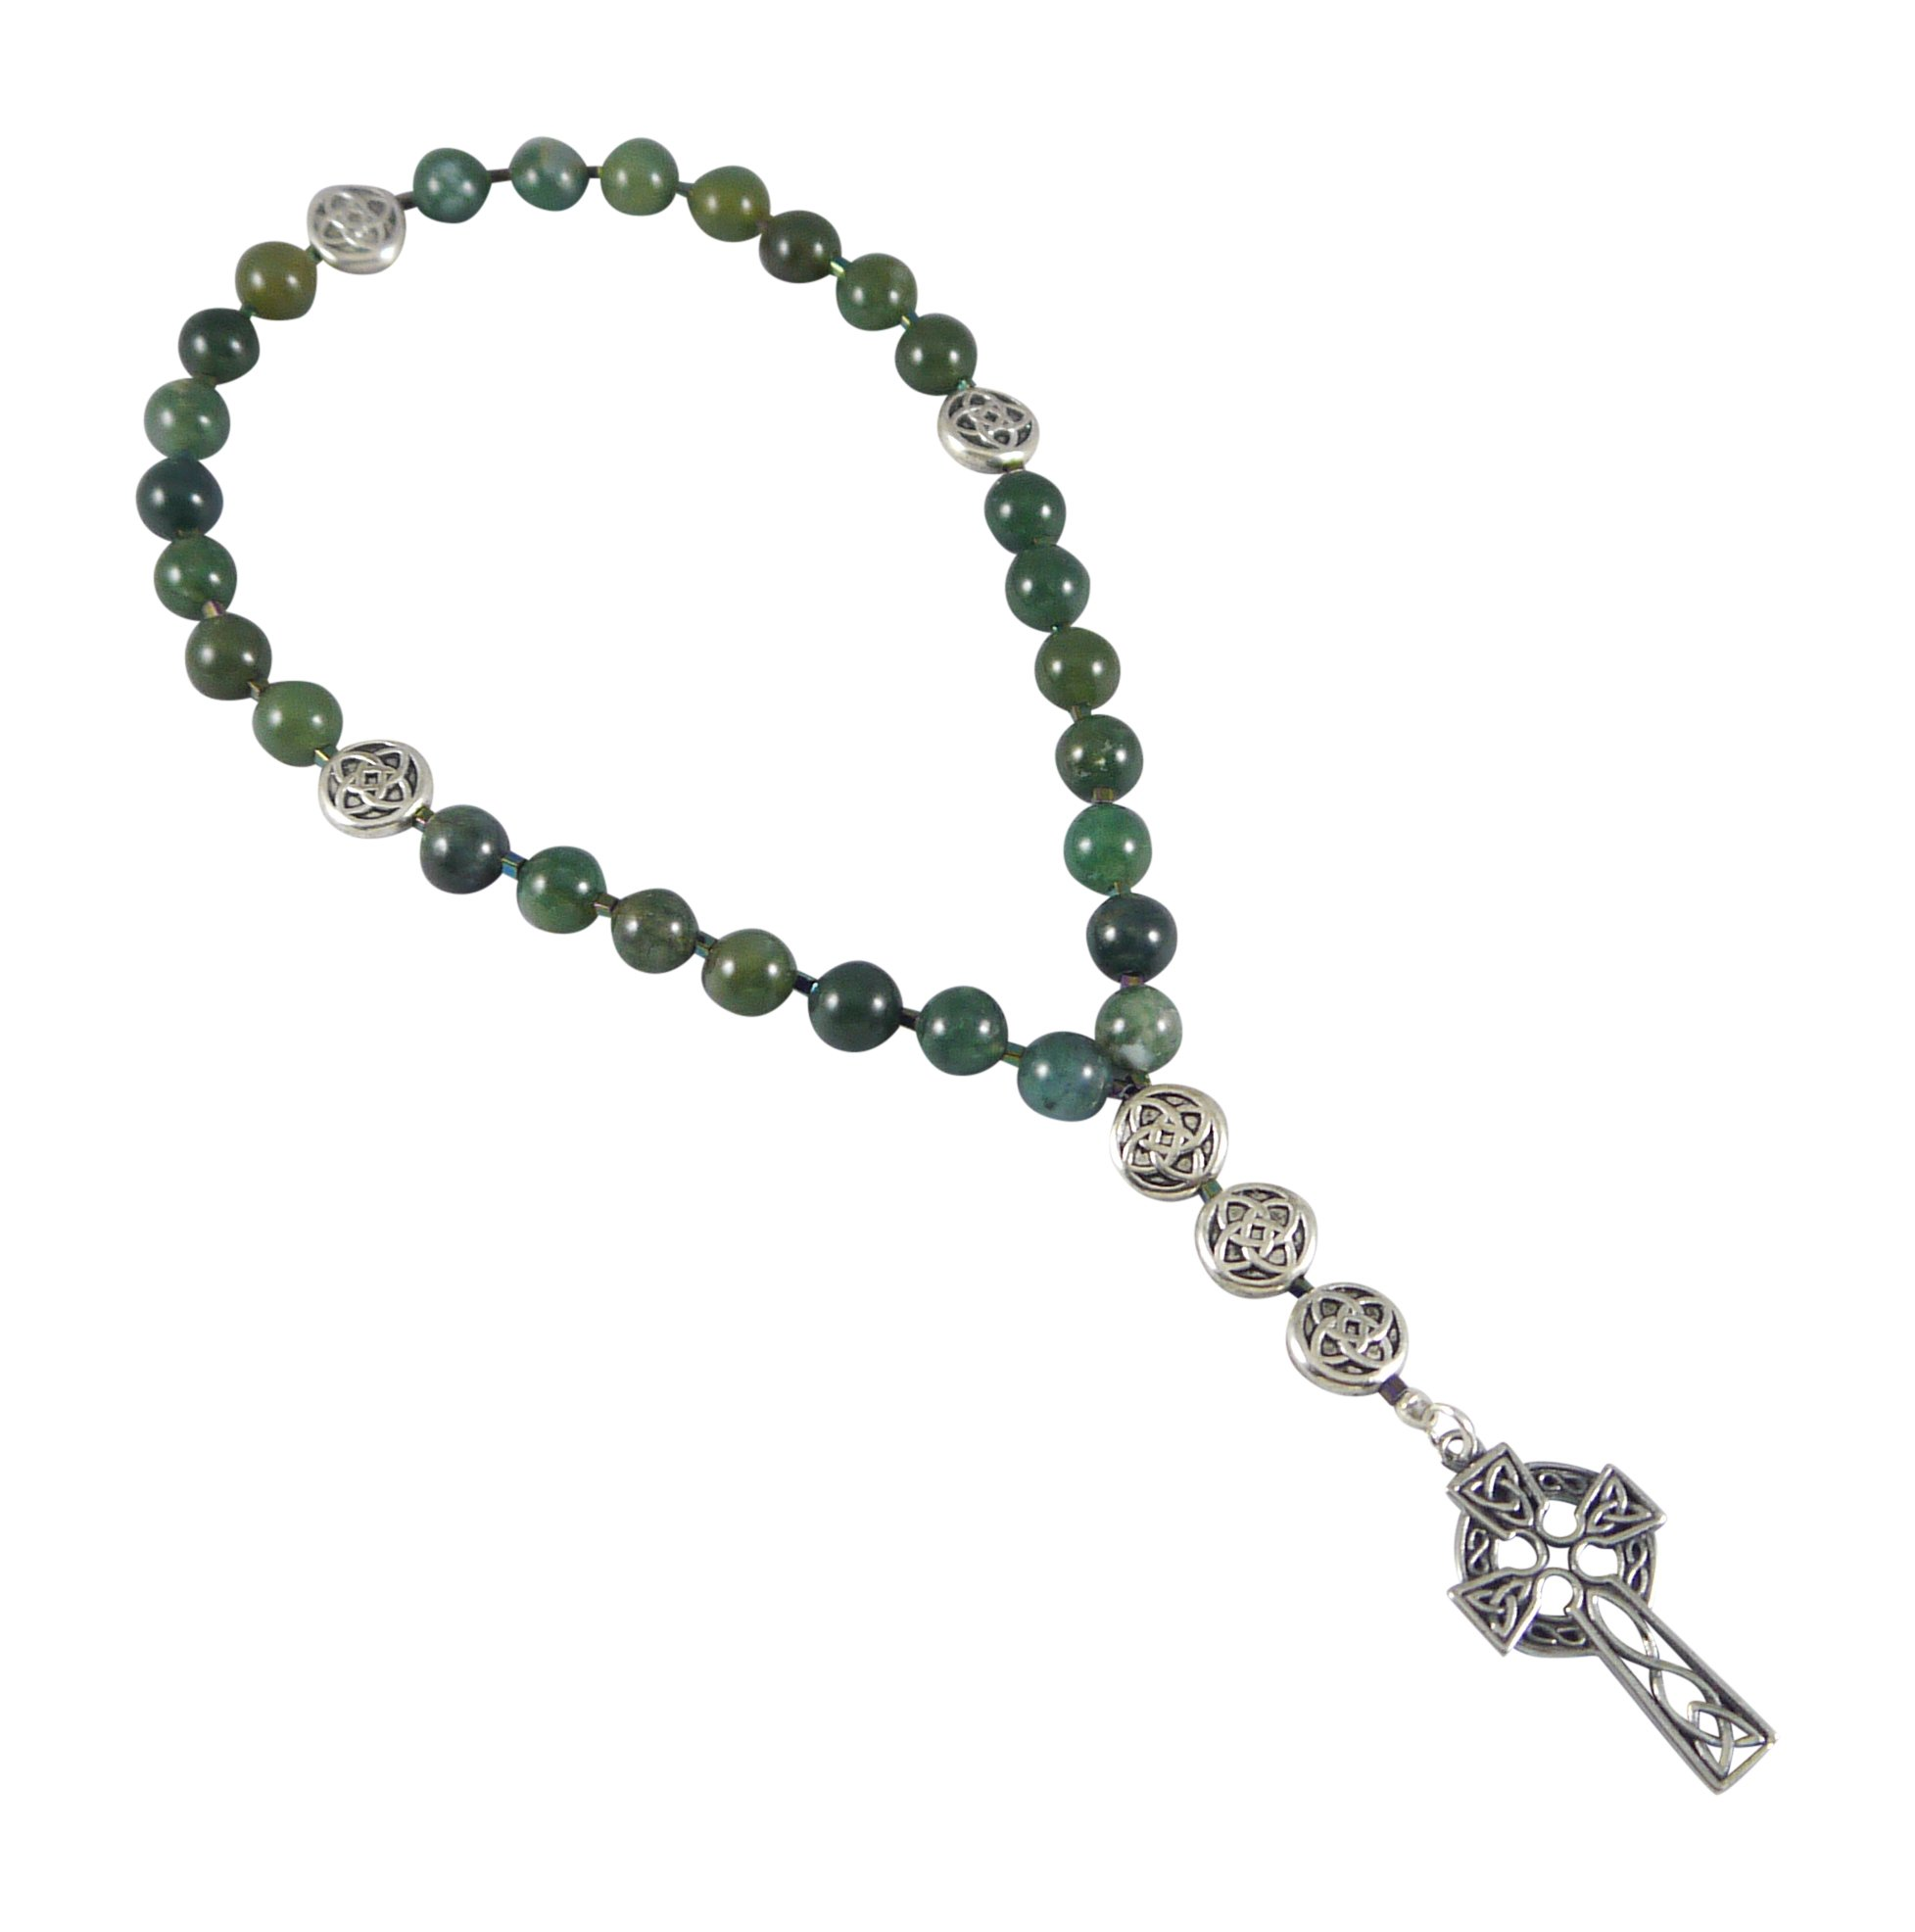 Kit Johnson Designs Anglican Rosary Beads, Moss Agate, Celtic Cross, Prayer Bag, Instruction Booklet